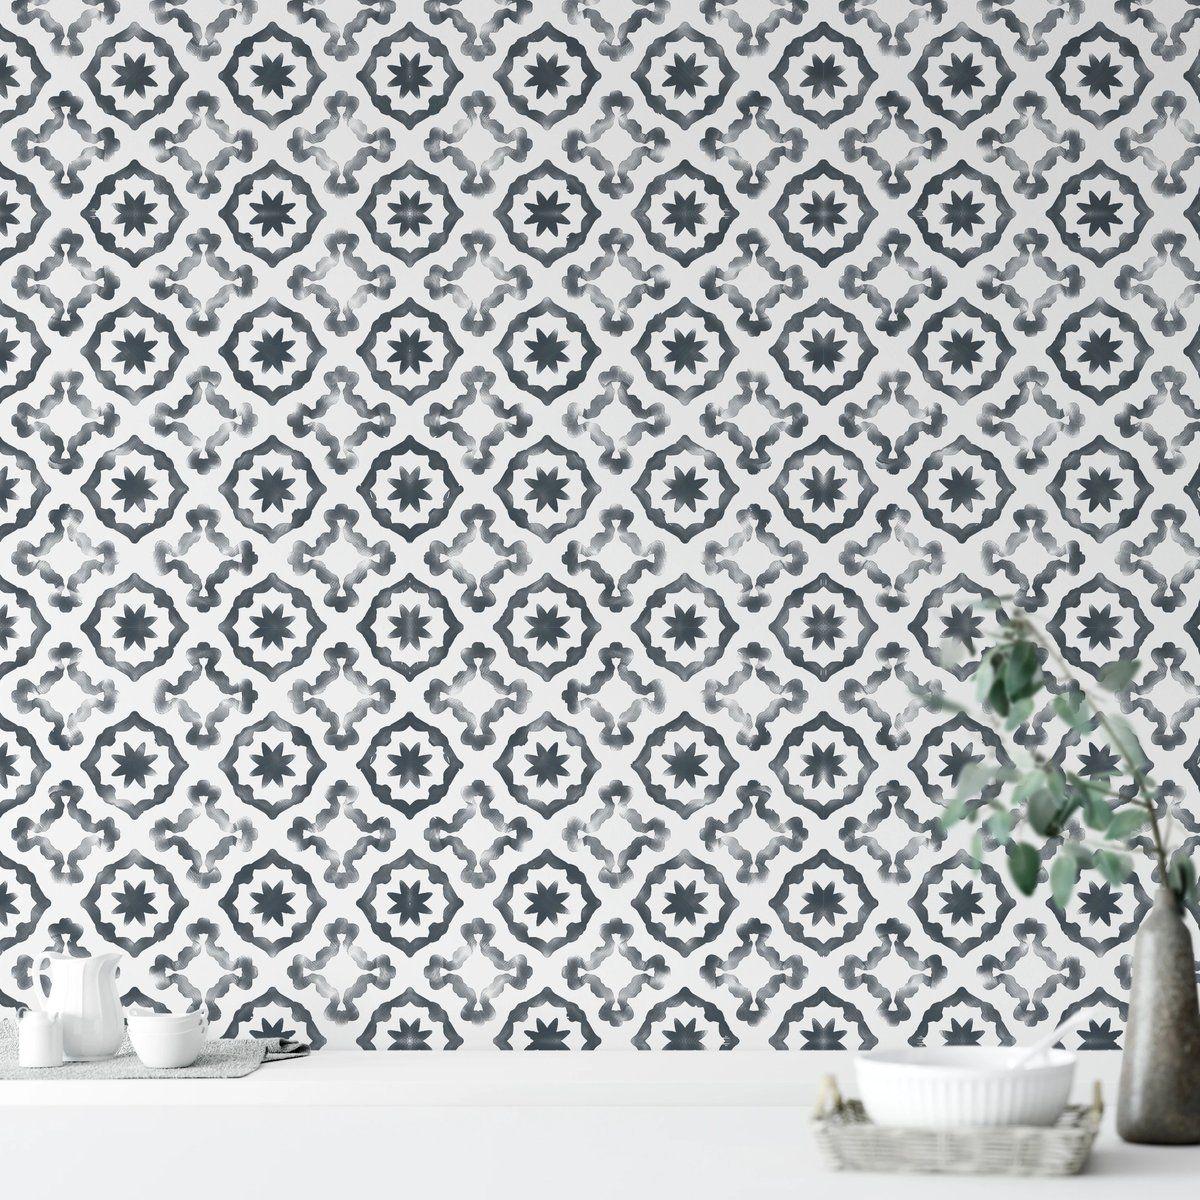 Geometric Wallpaper Designs Peel And Stick Wallpaper Removable Wallpaper Premium Hom Geometric Wallpaper Design Peel And Stick Wallpaper Geometric Wallpaper